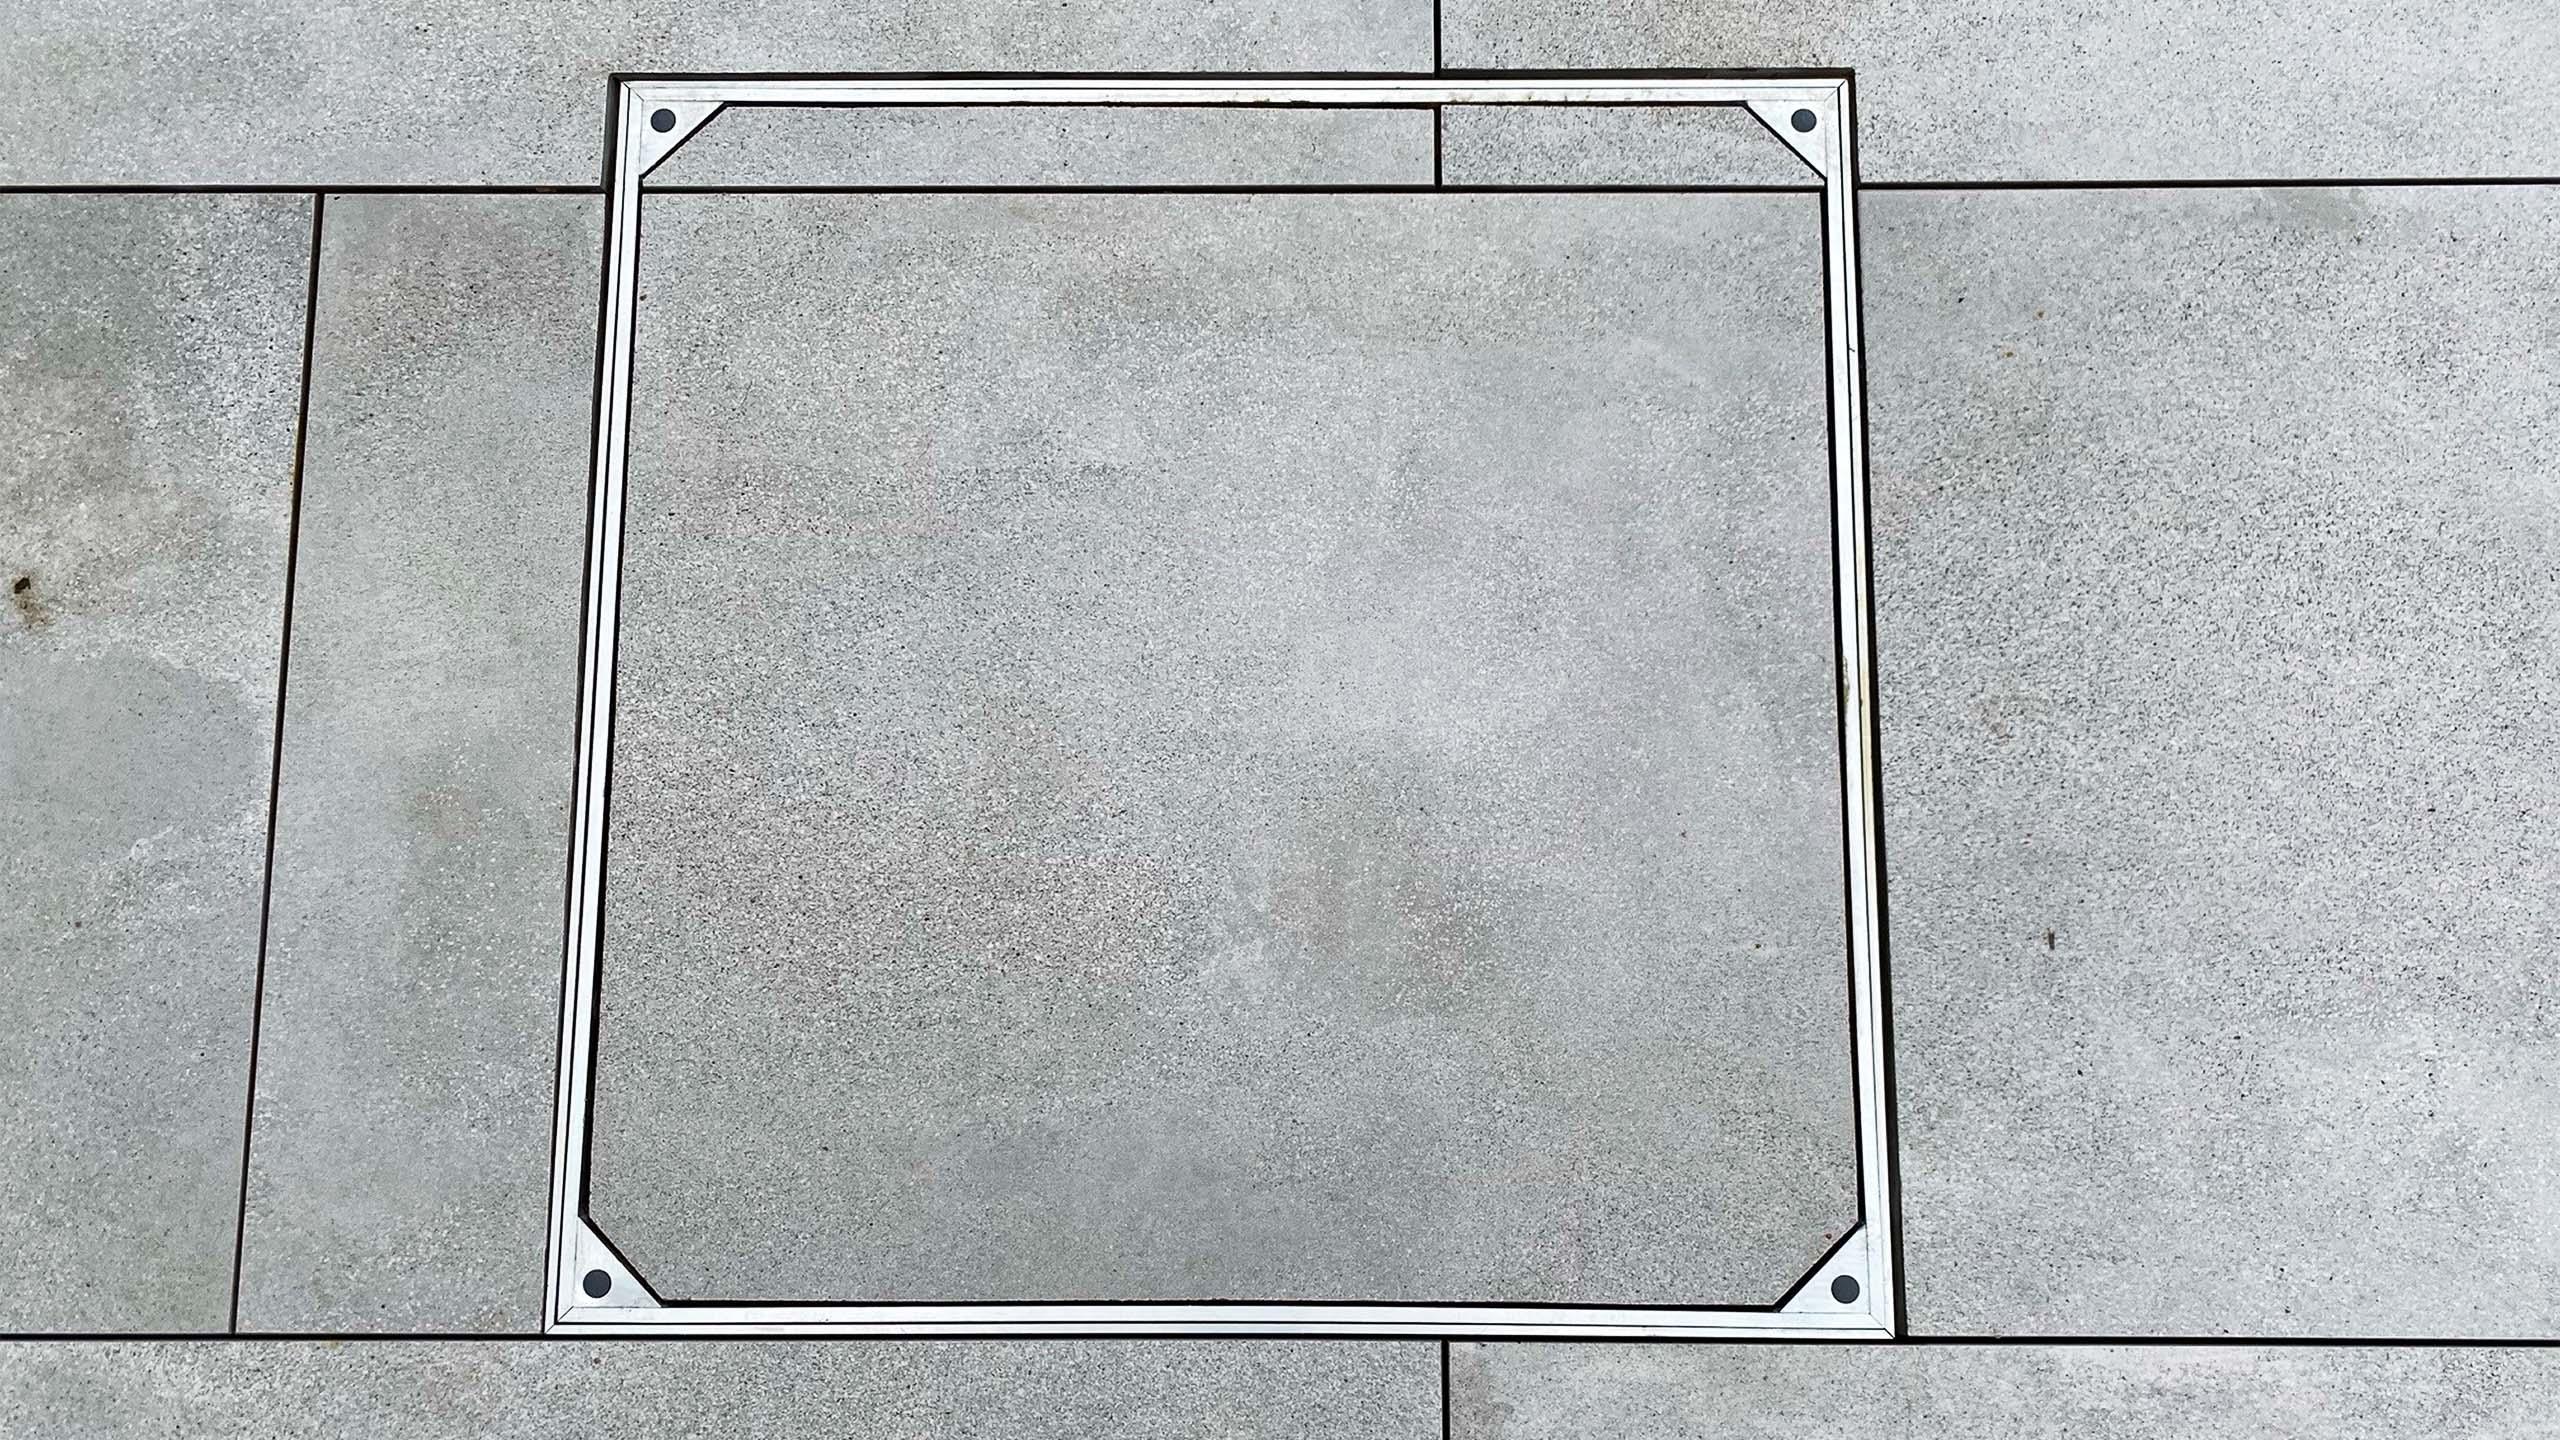 Aluminium Triple Sealed Square Manhole Cover With Slab Floor